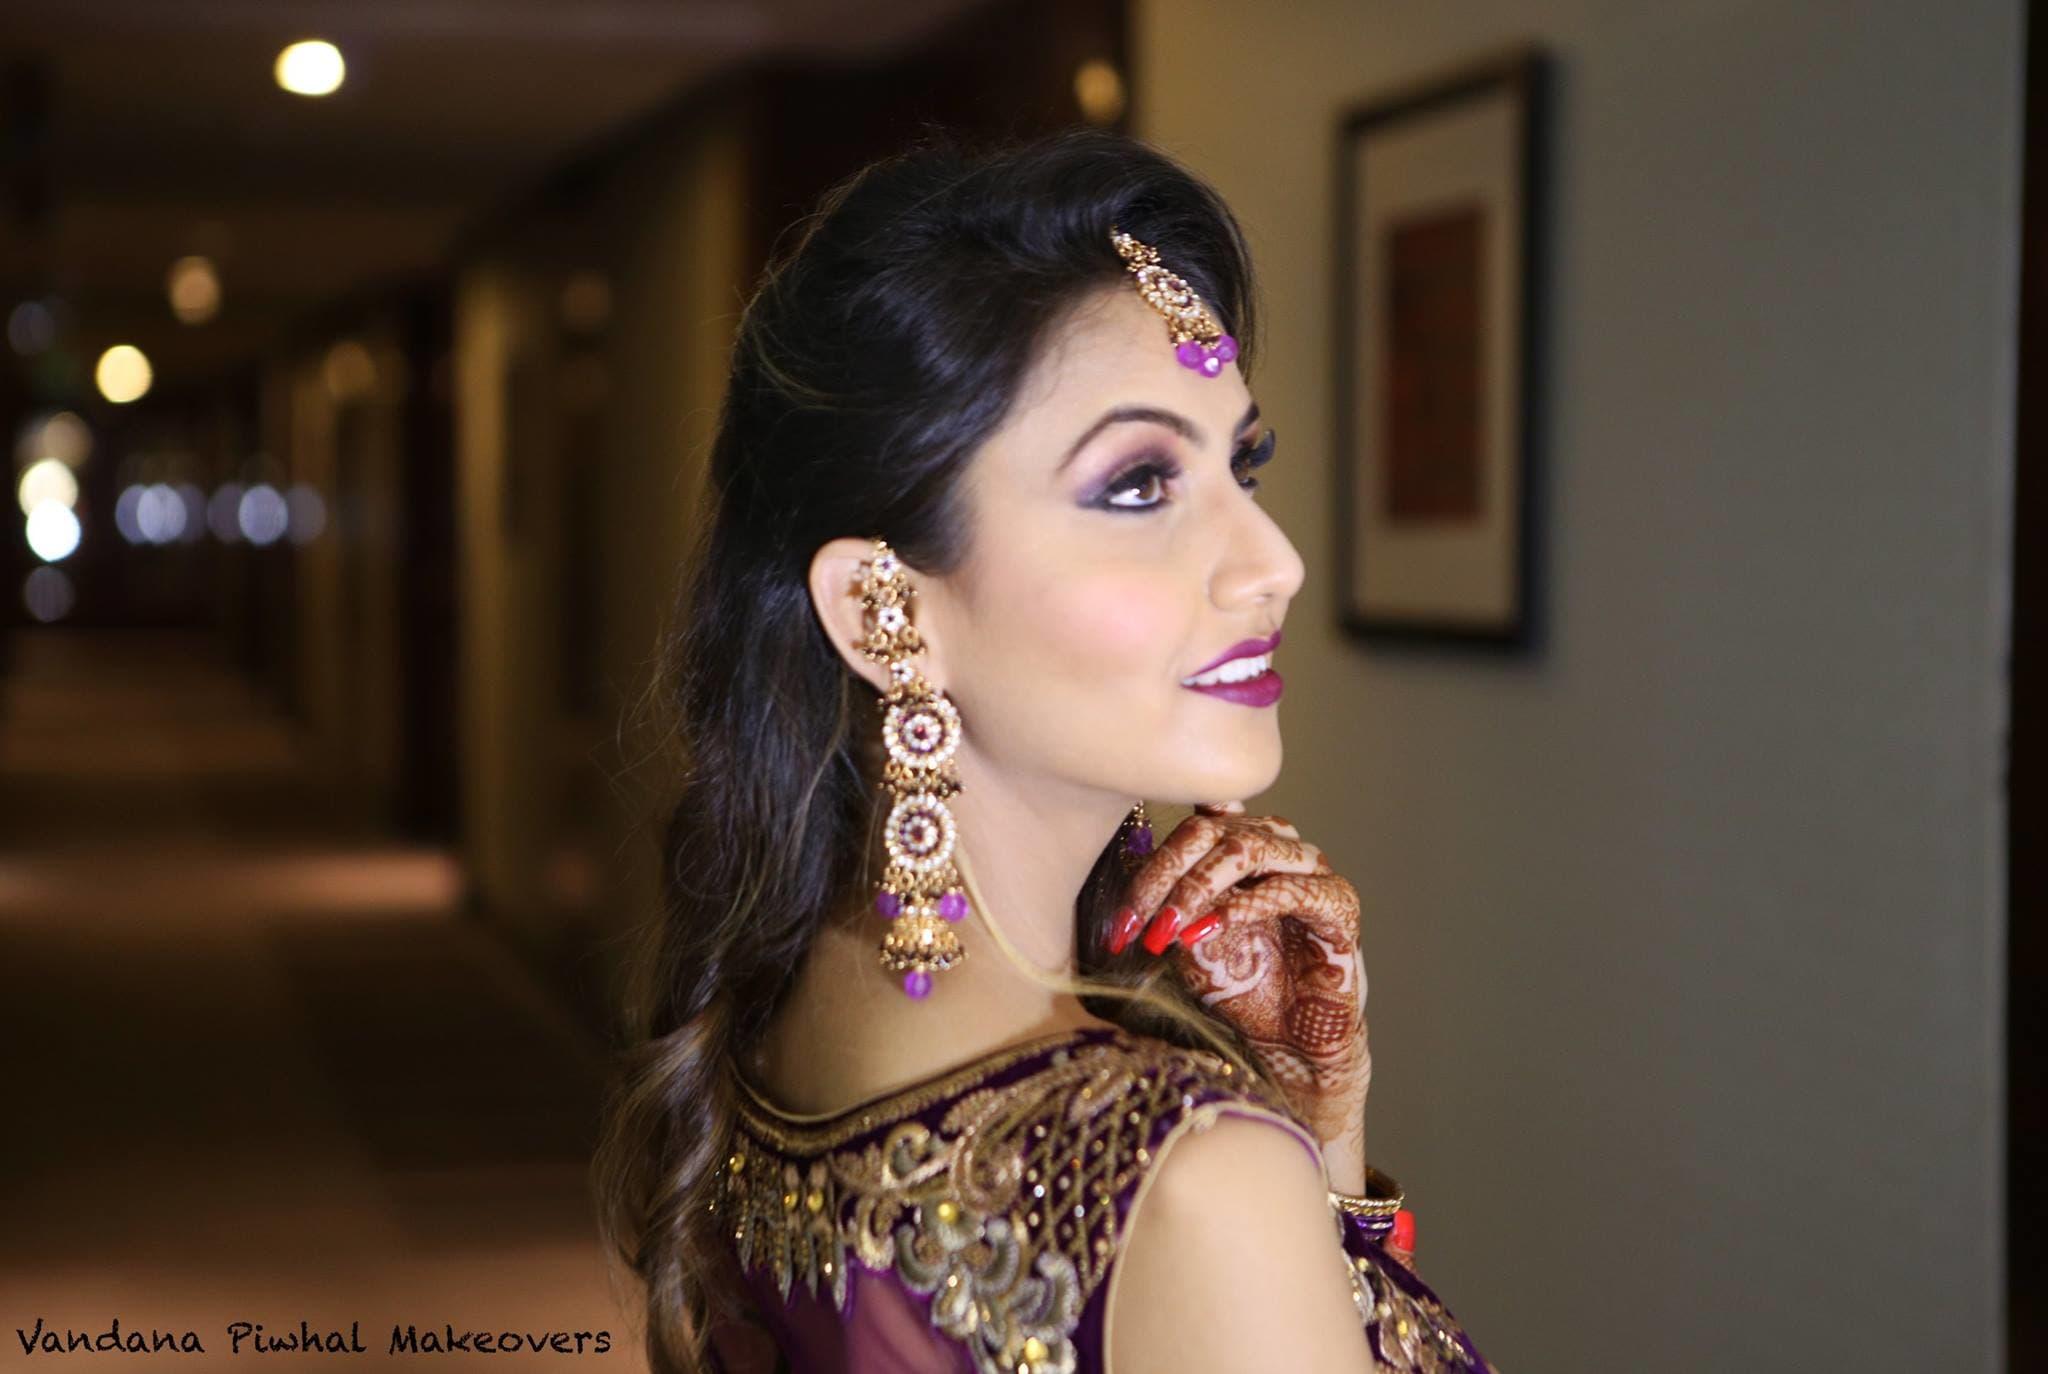 Vandana Piwhal Makeovers